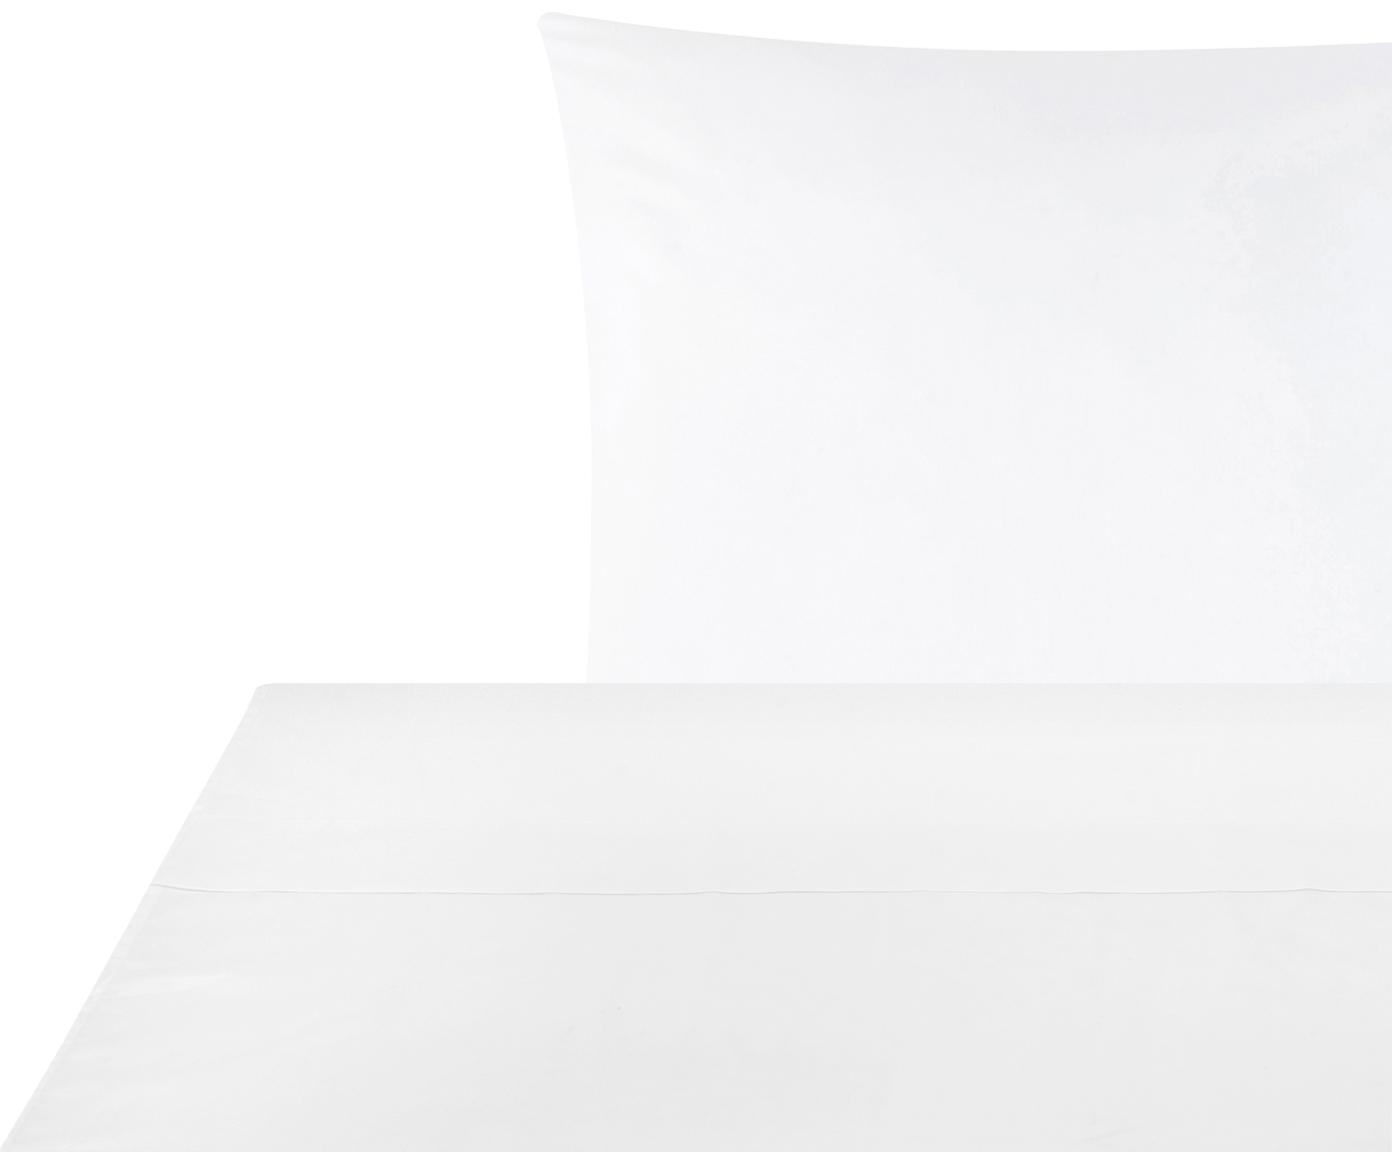 Sábana encimera de satén Comfort, Blanco, Cama 150/160 cm (240 x 270 cm)